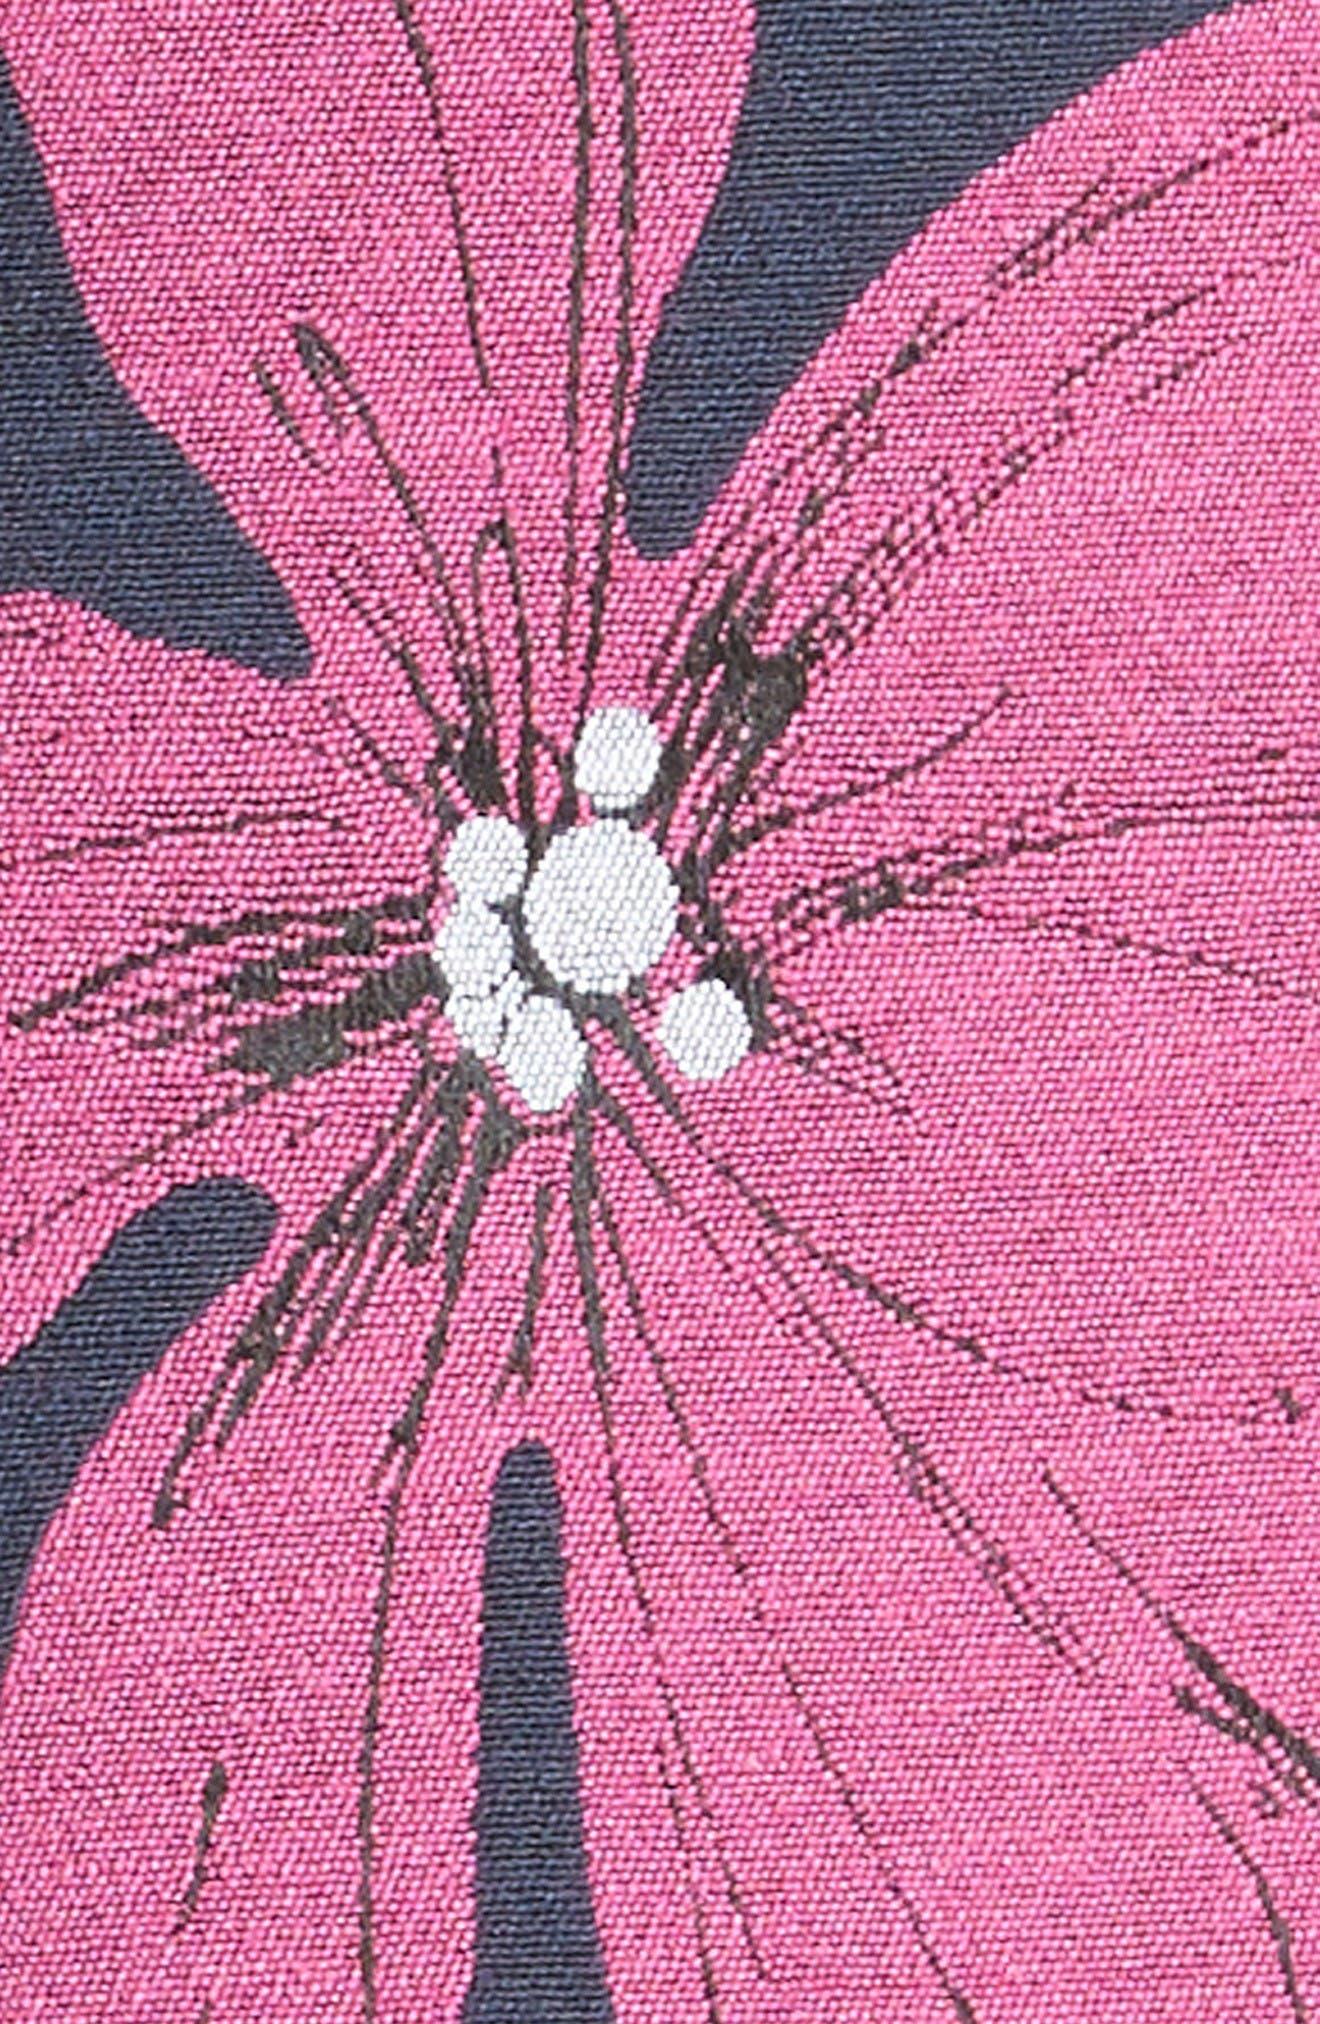 Floral Print Stretch Jacquard Tunic Dress,                             Alternate thumbnail 3, color,                             Navy/ Fuchsia